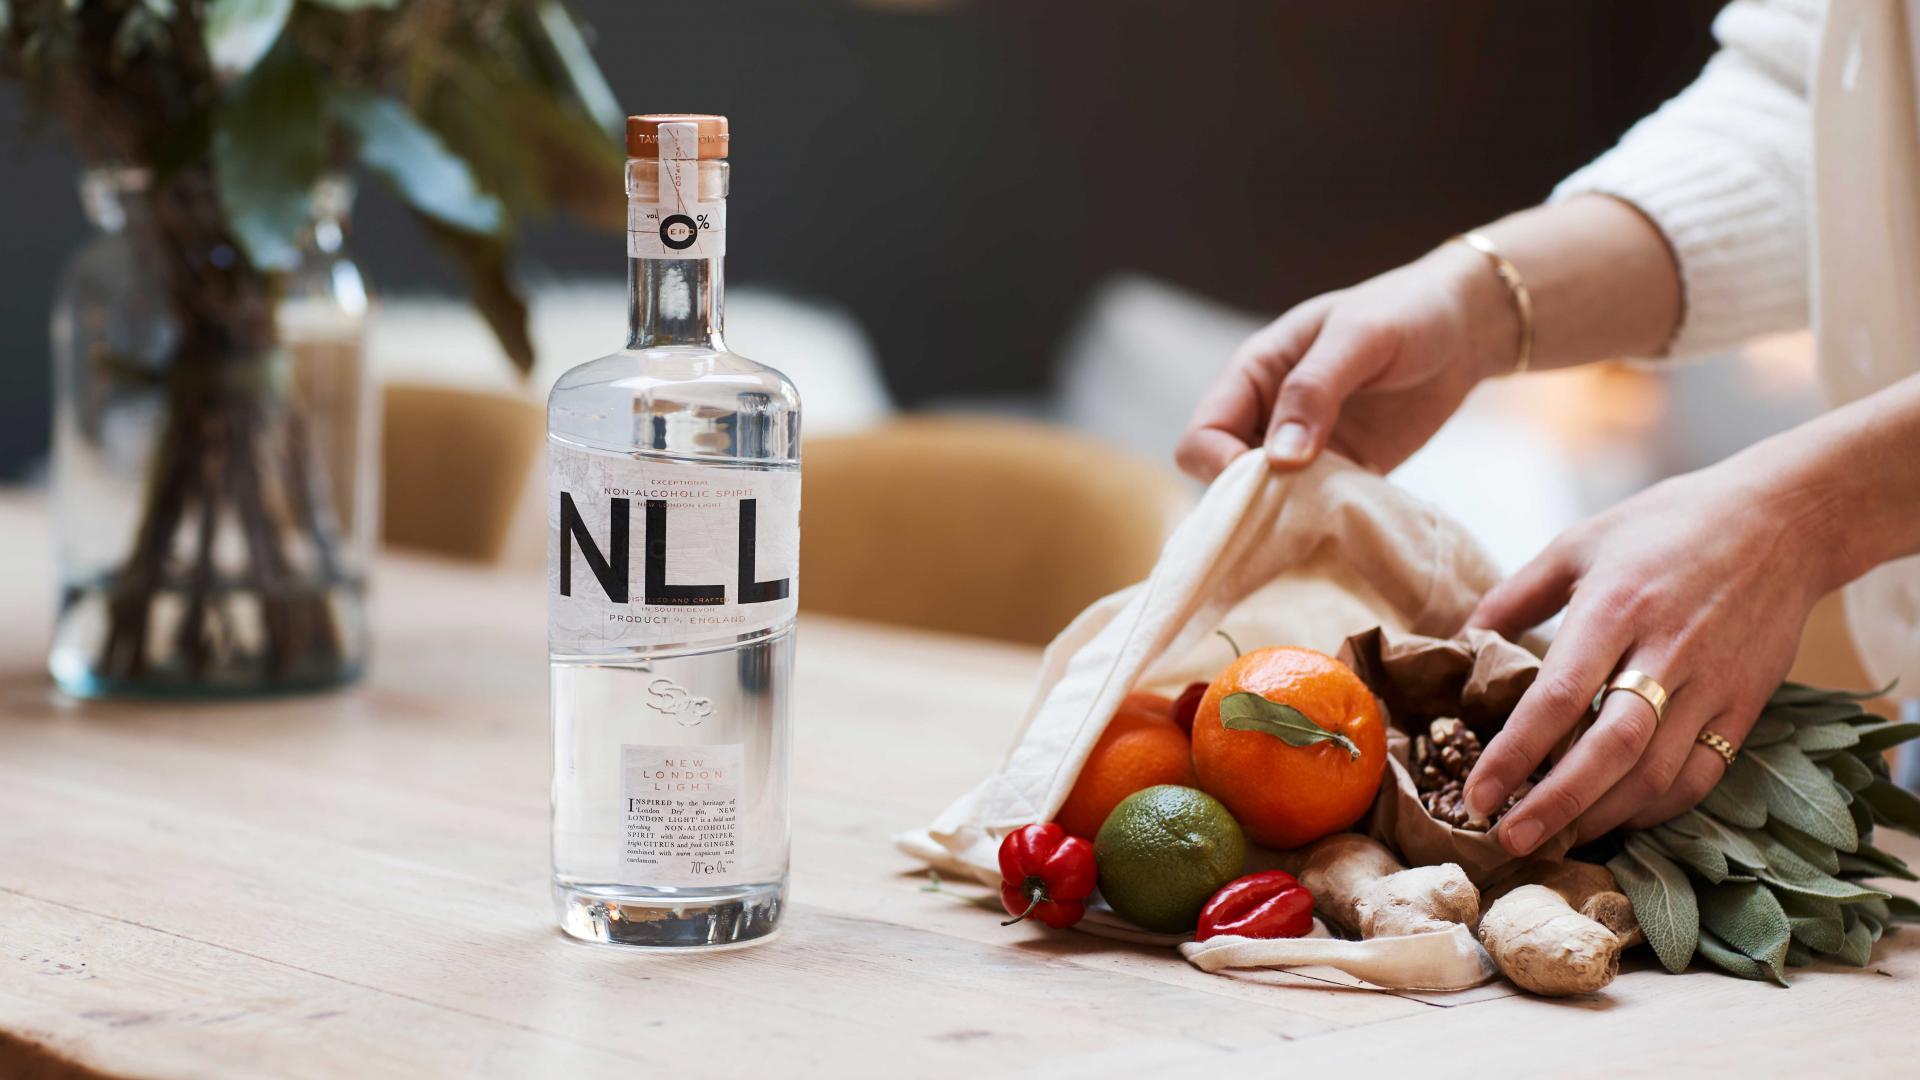 Non-alcoholic spirits: Salcombe Distilling Co New London Light